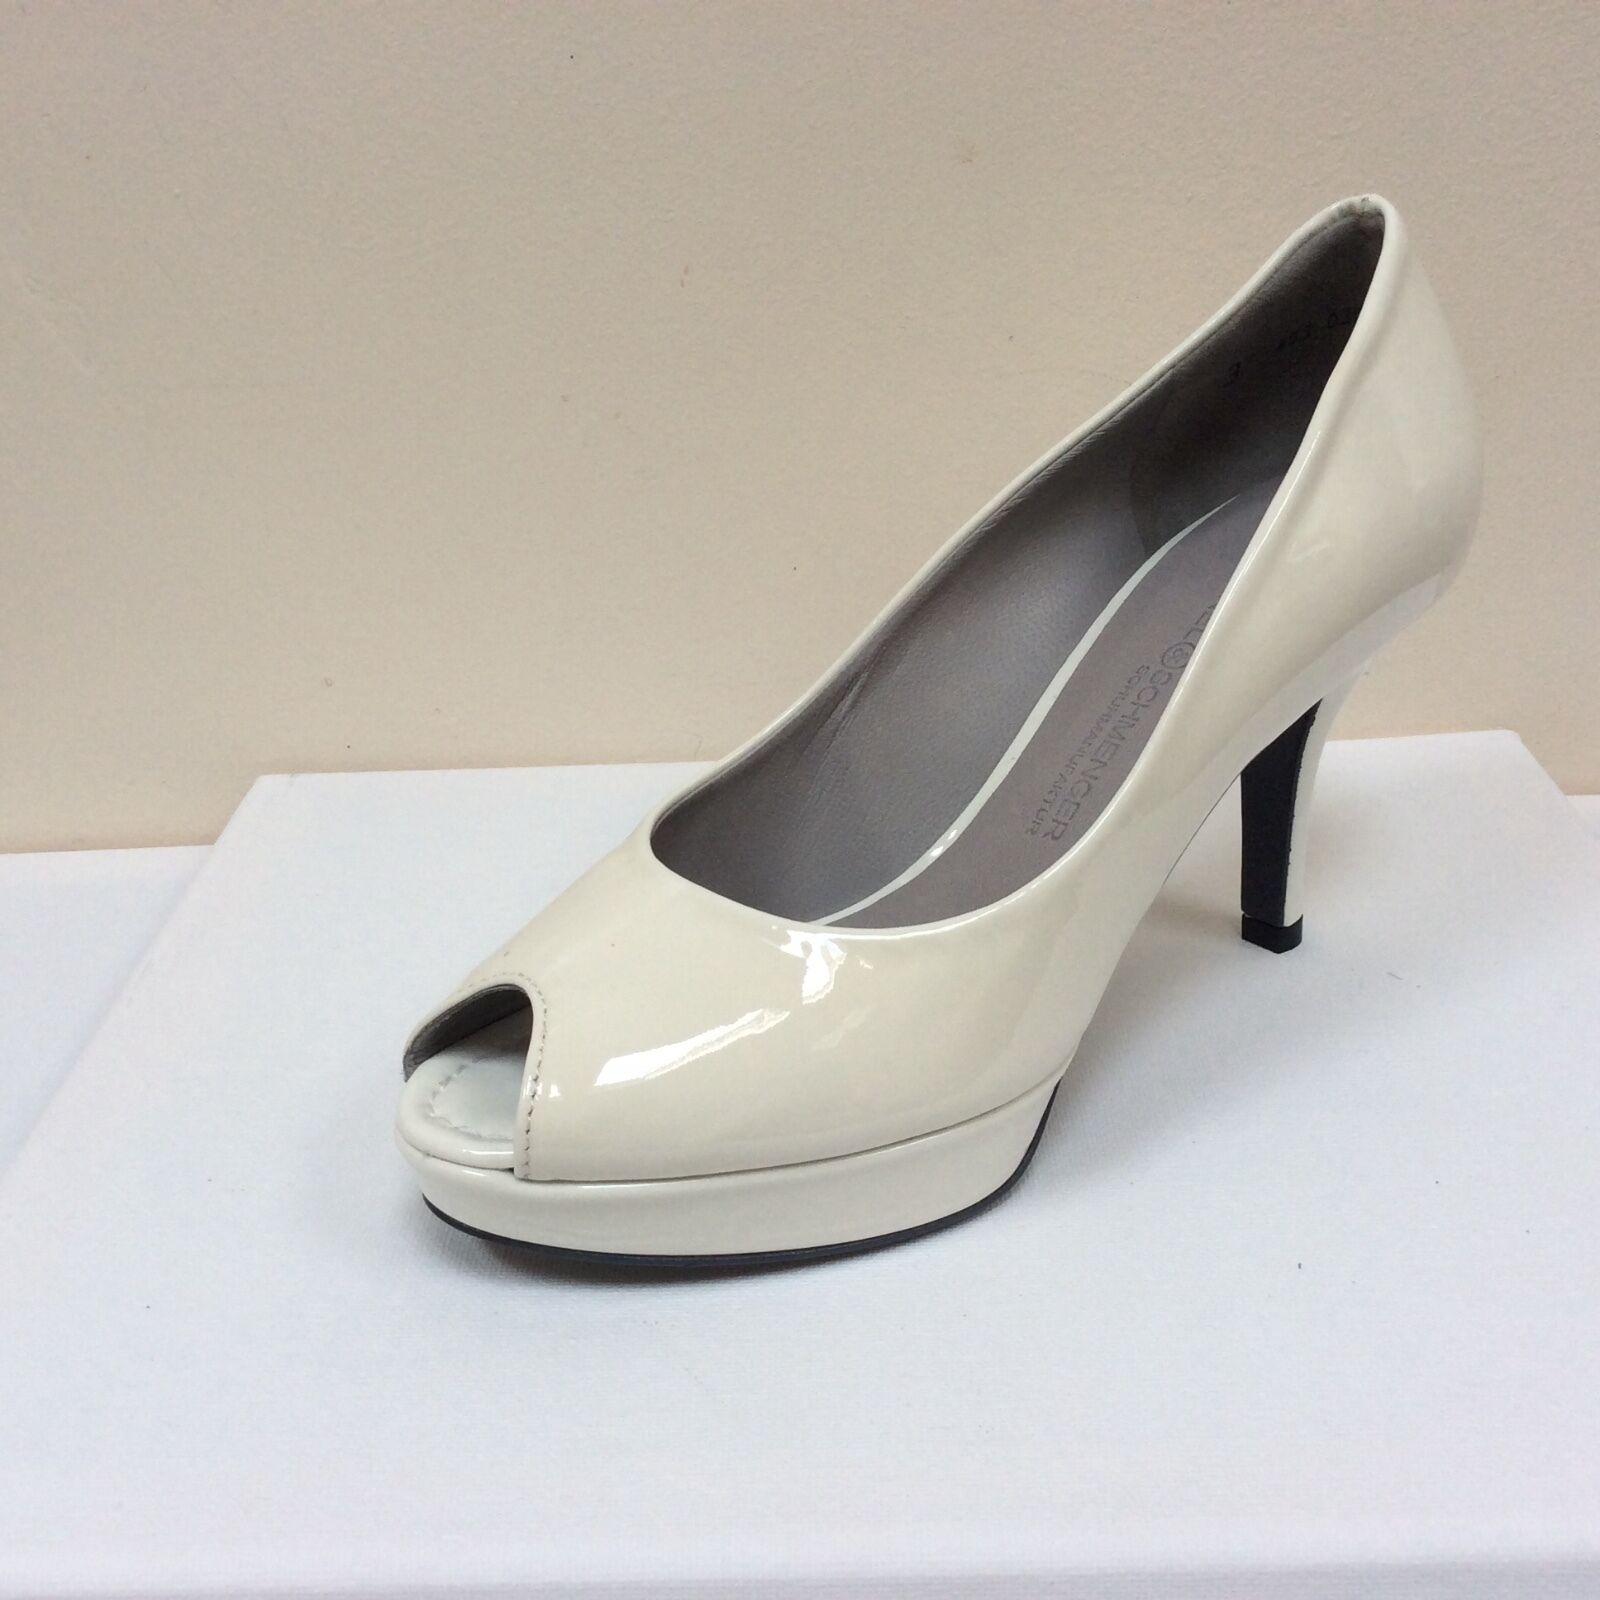 K&S Weiß patent peep toe platform court schuhe, UK 8/EU 41,   BNWB